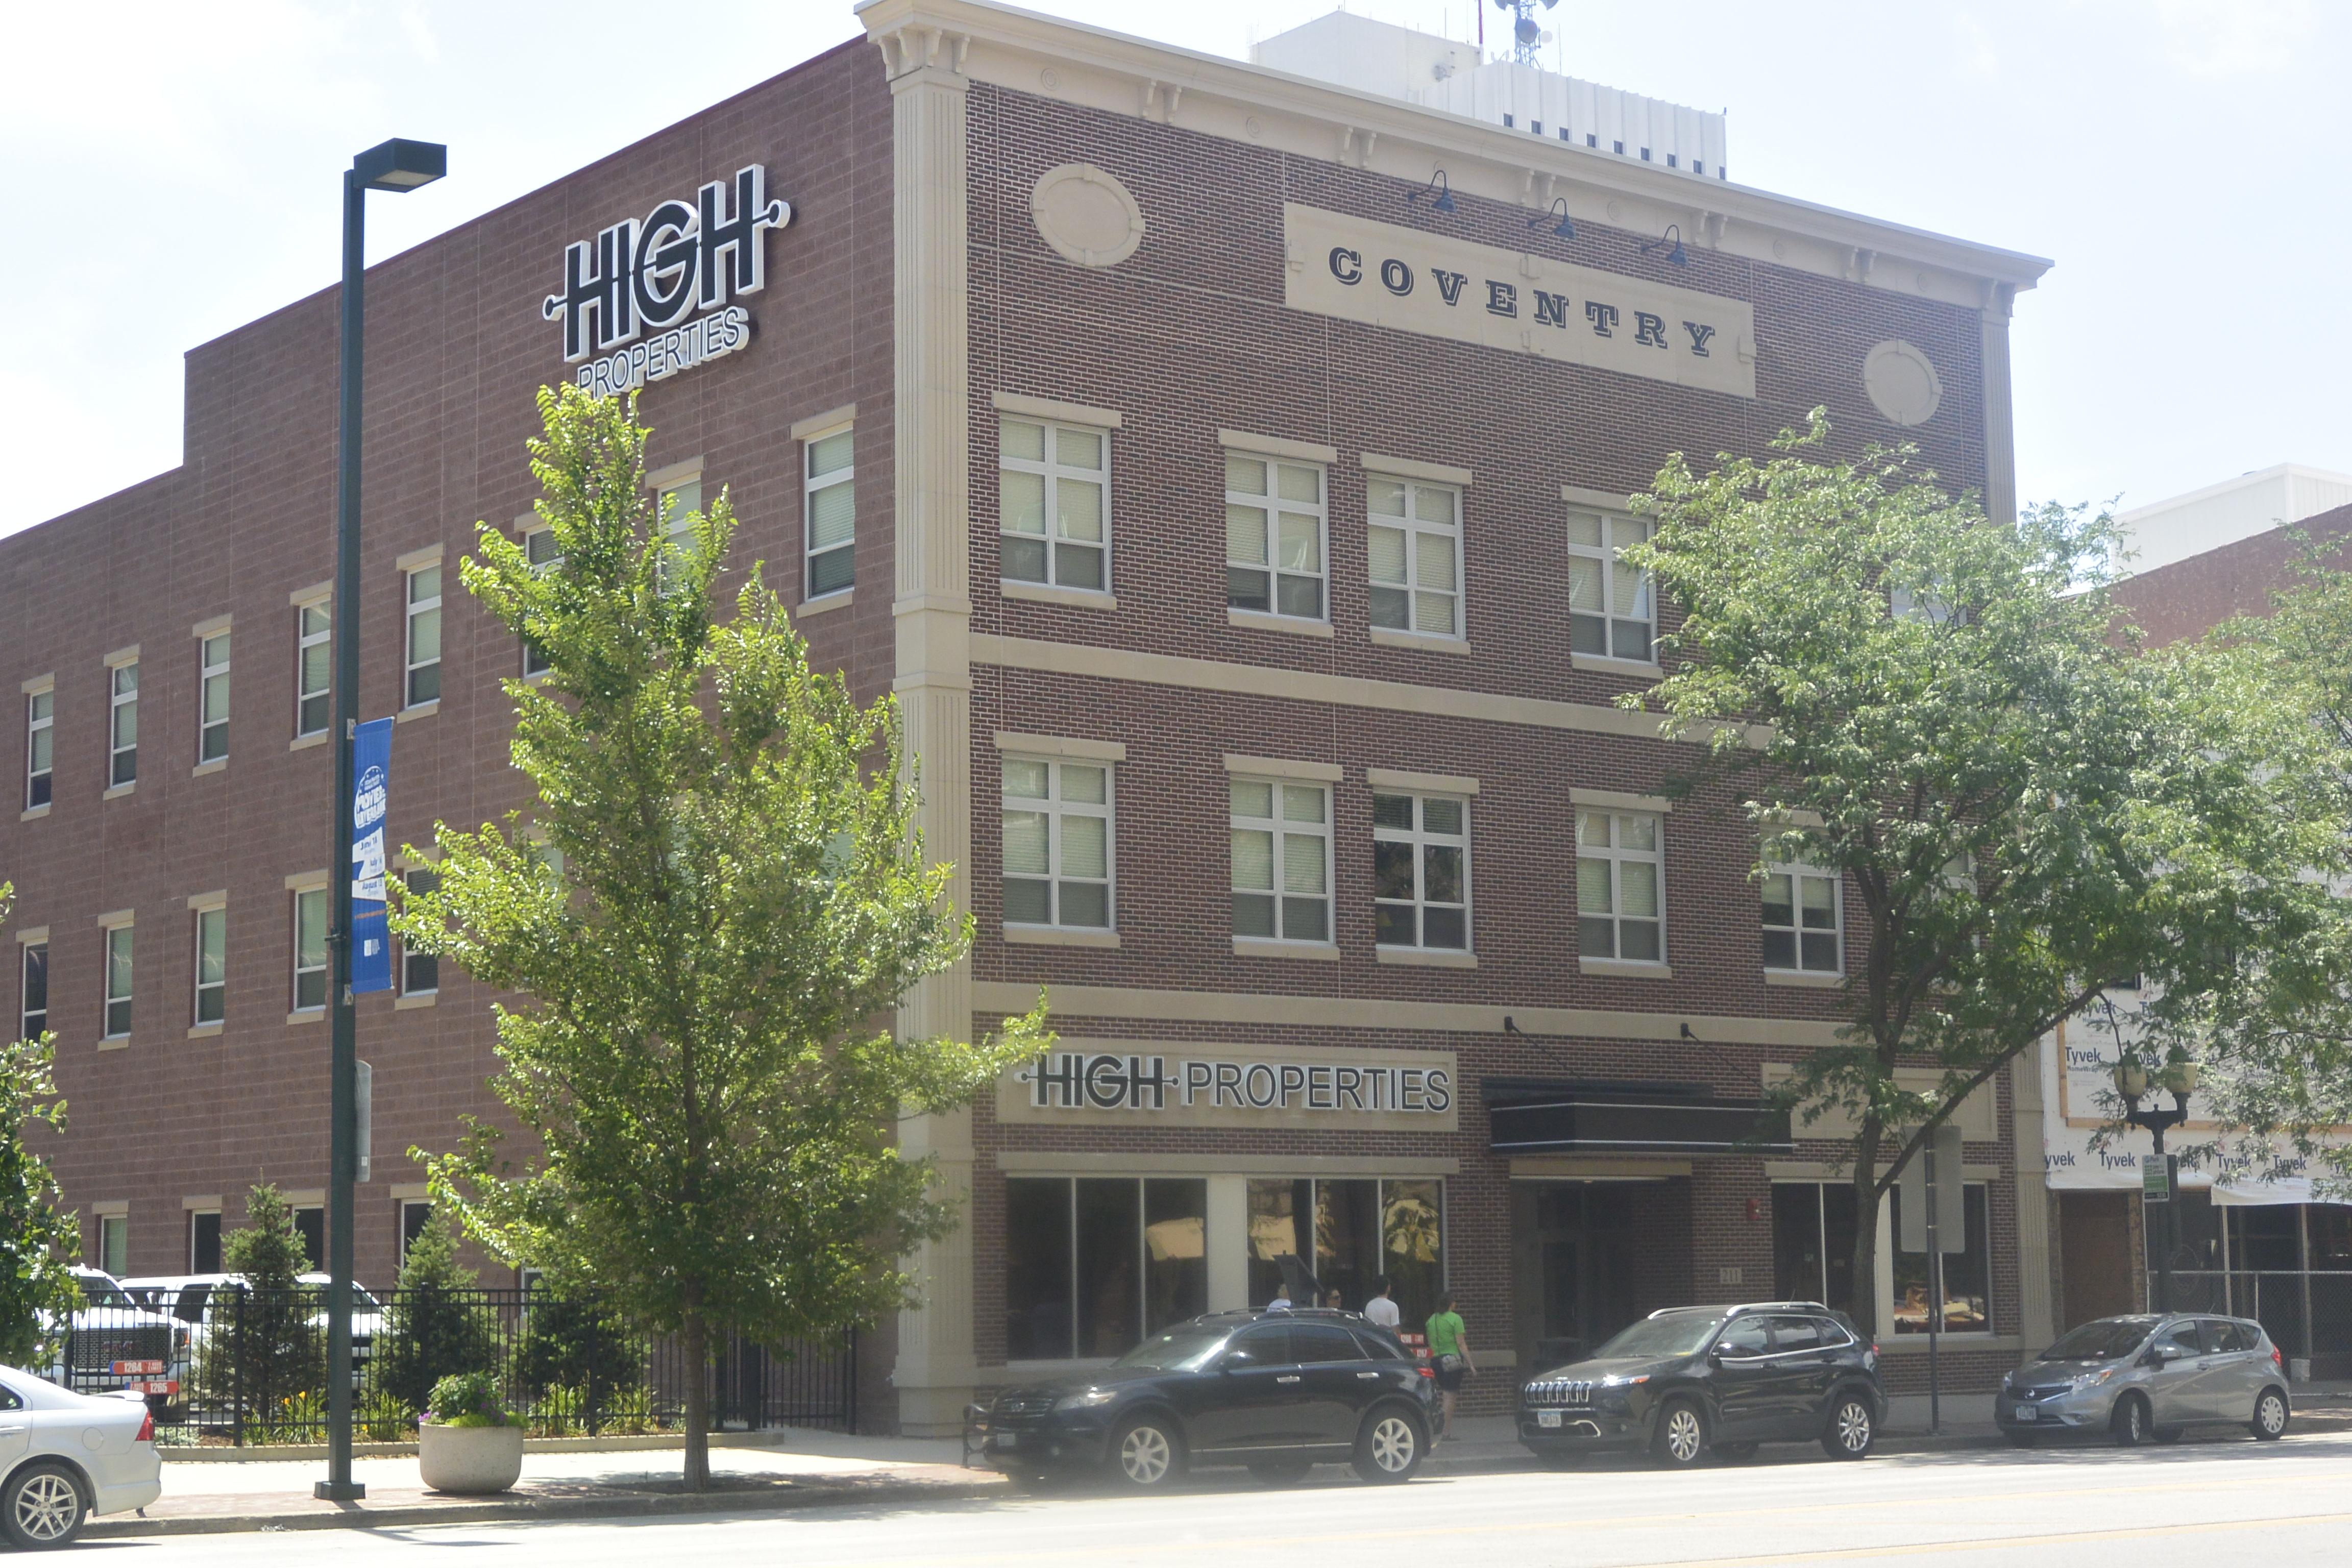 Commercial Property For Rent In Cedar Rapids Iowa